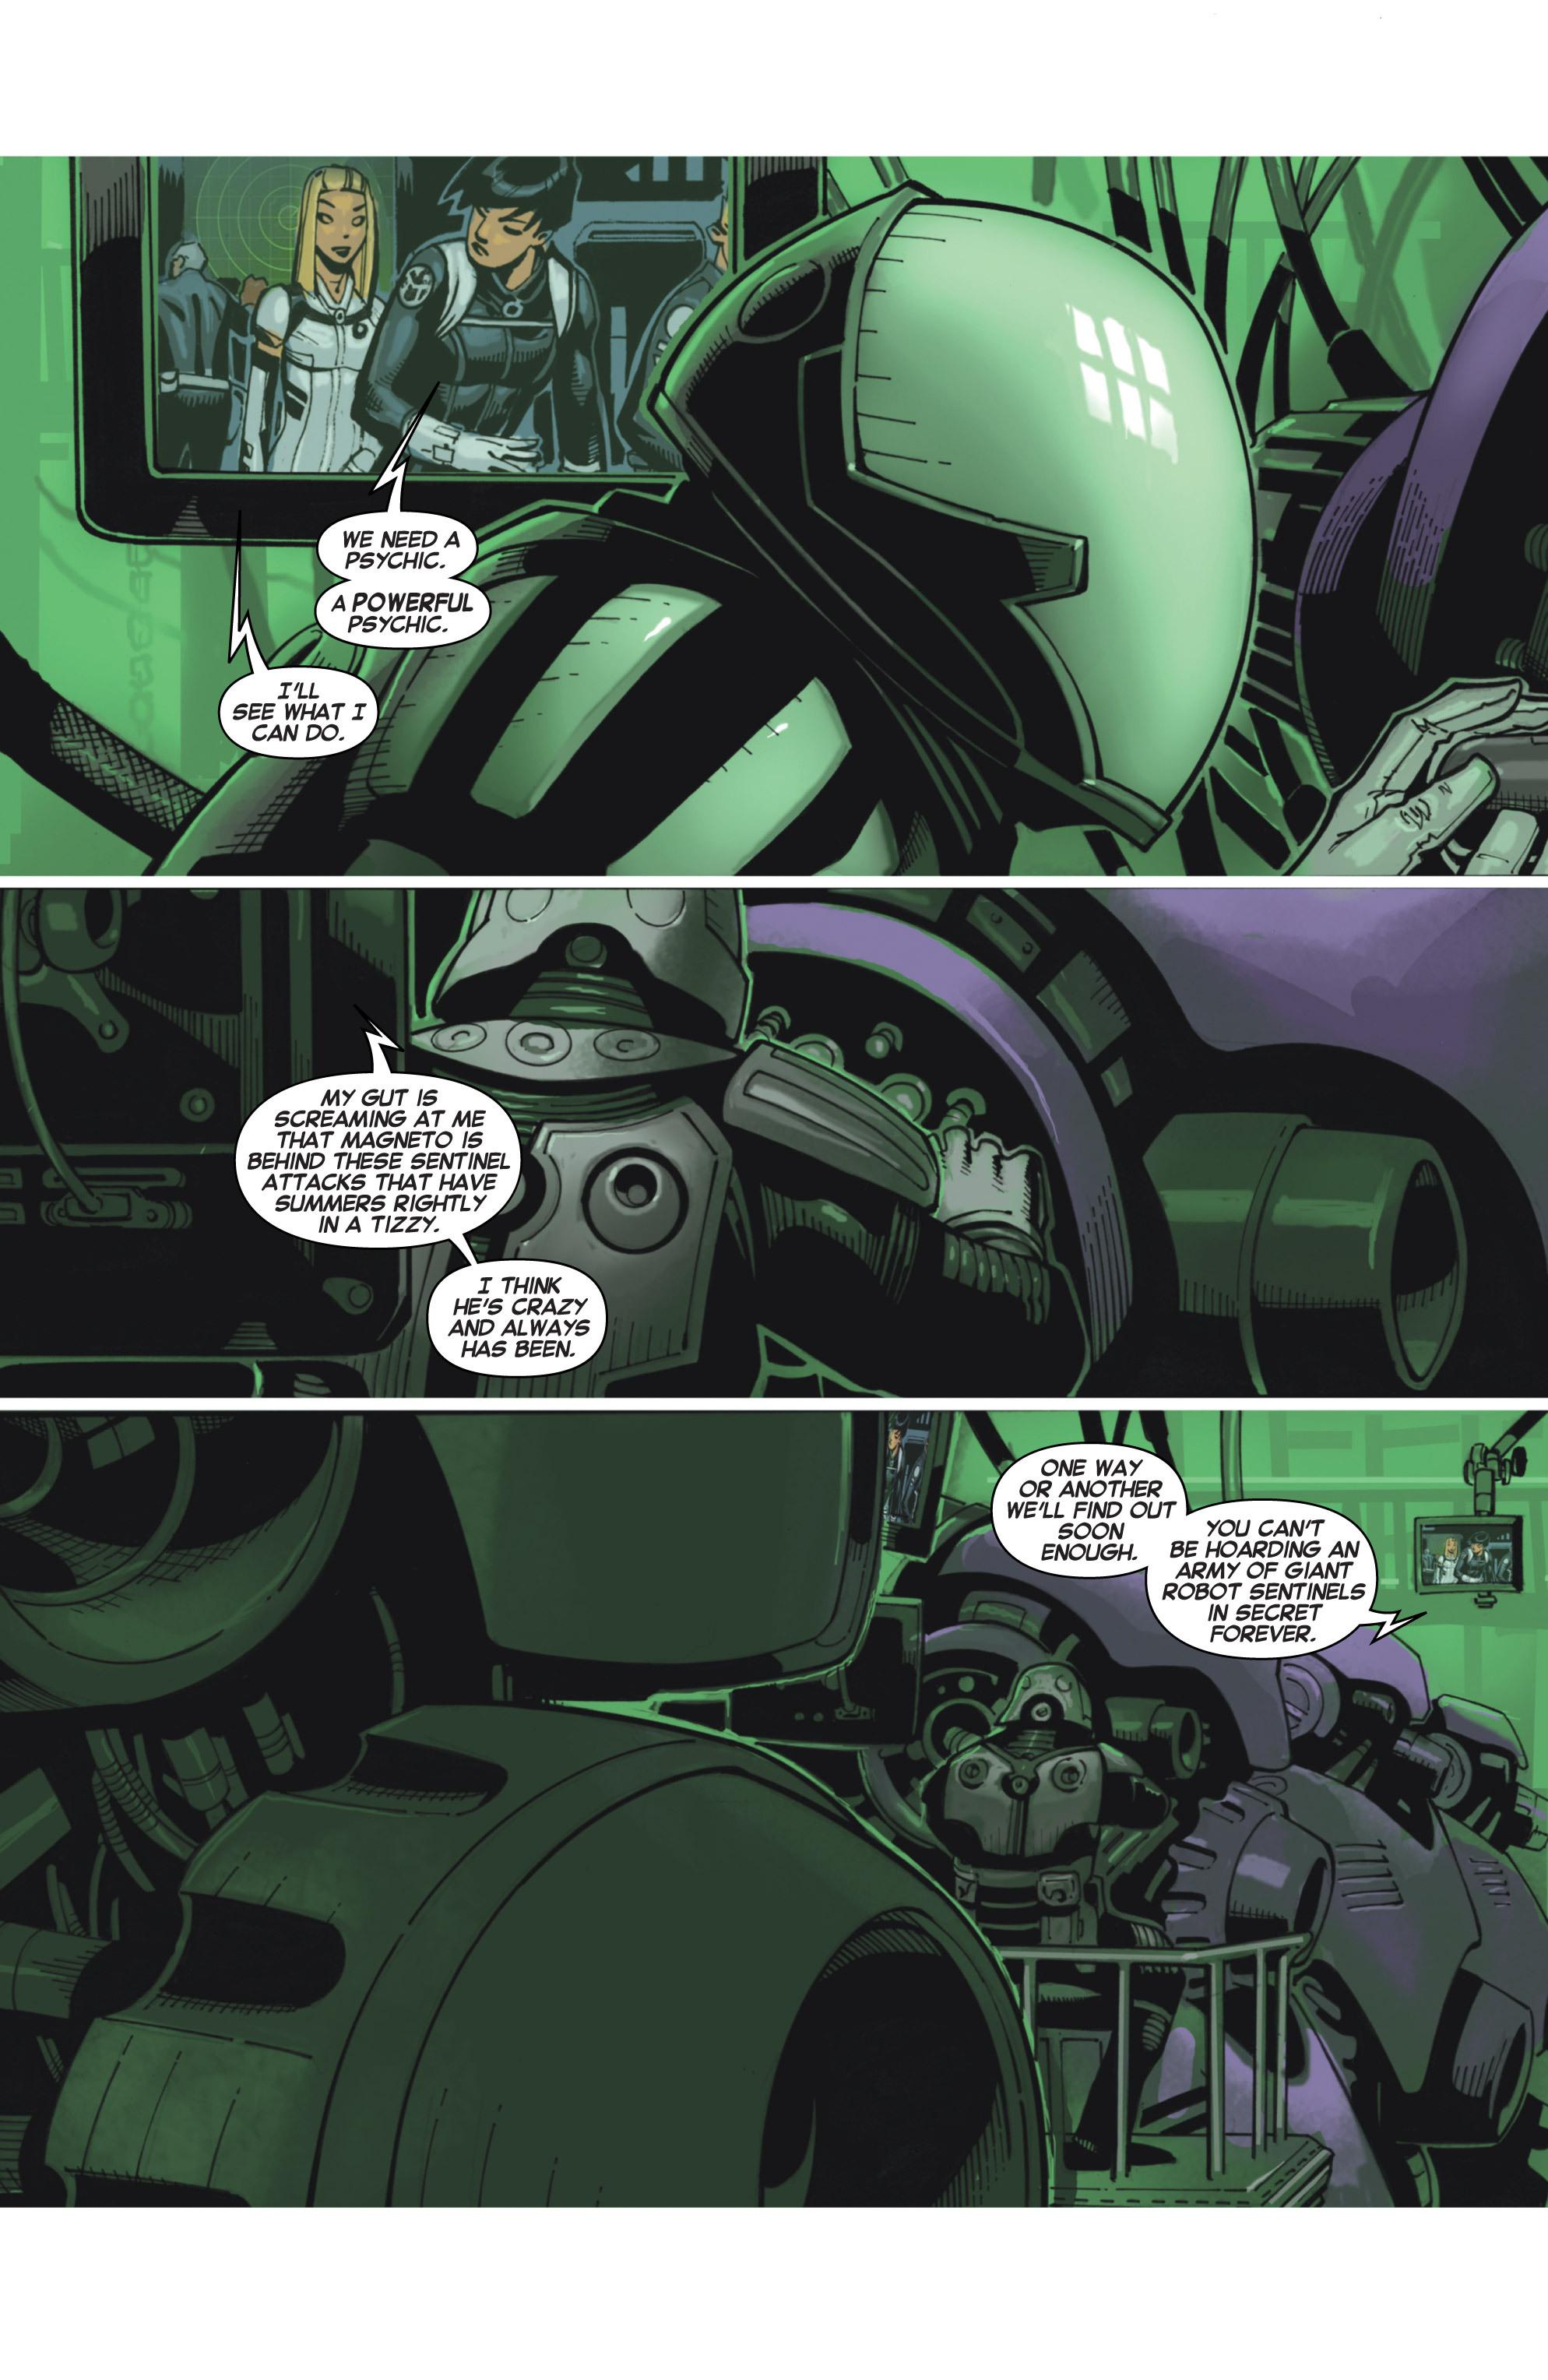 Read online Uncanny X-Men (2013) comic -  Issue # _TPB 4 - vs. S.H.I.E.L.D - 34